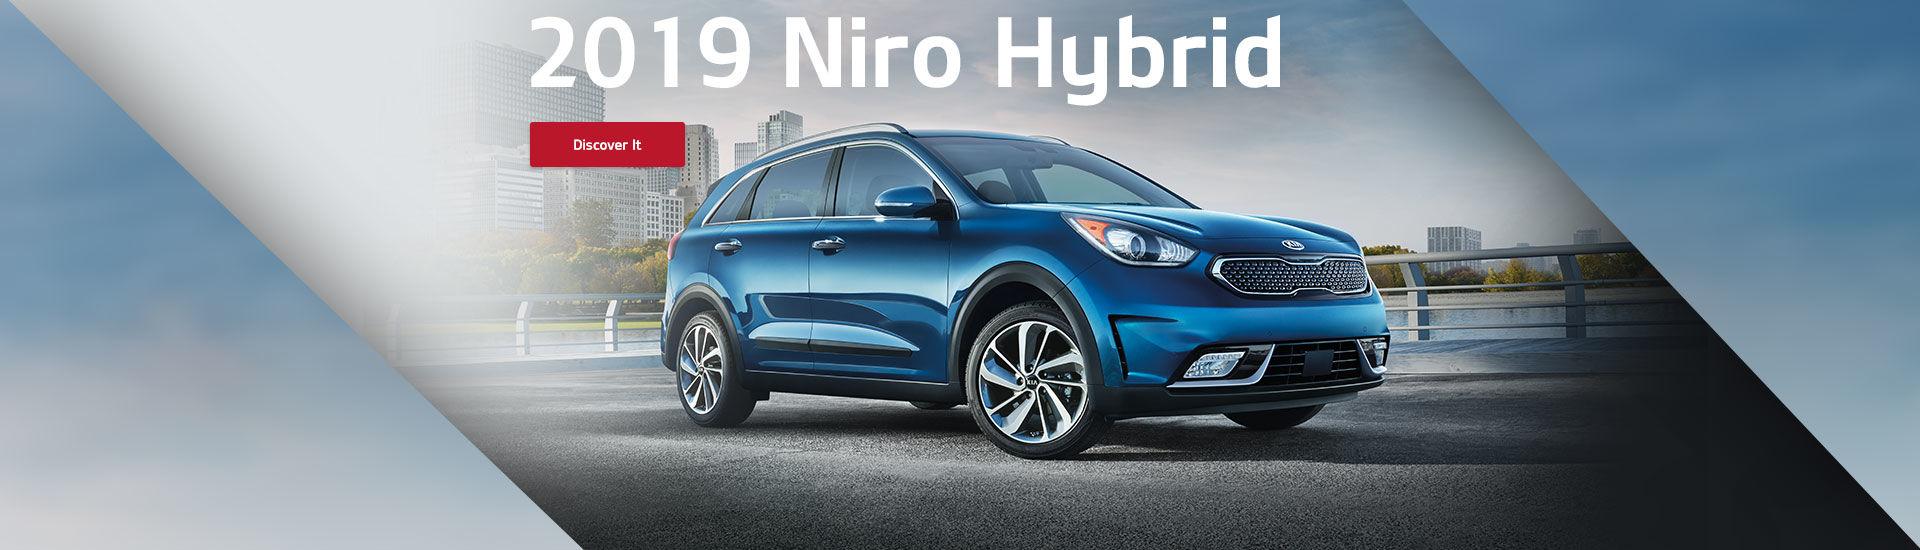 2019 Niro Hybrid